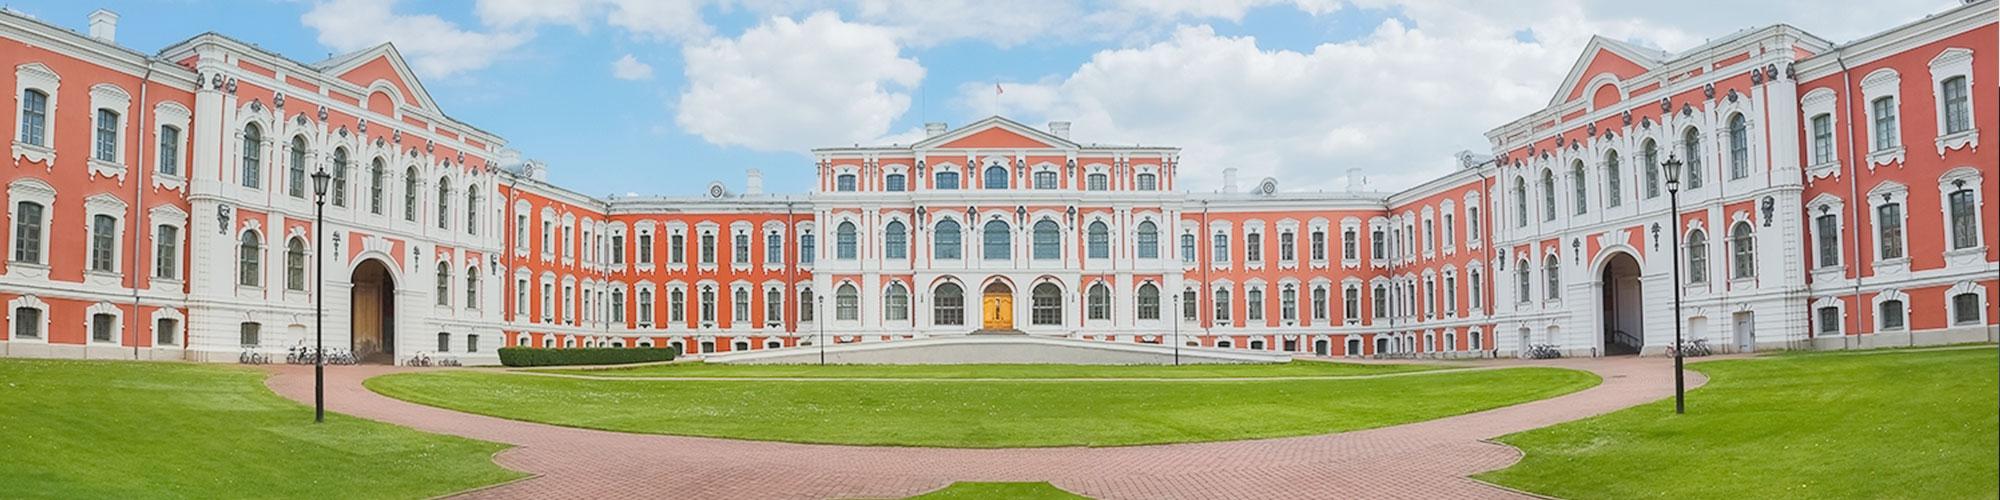 Latvia University of Agriculture in Jelgava